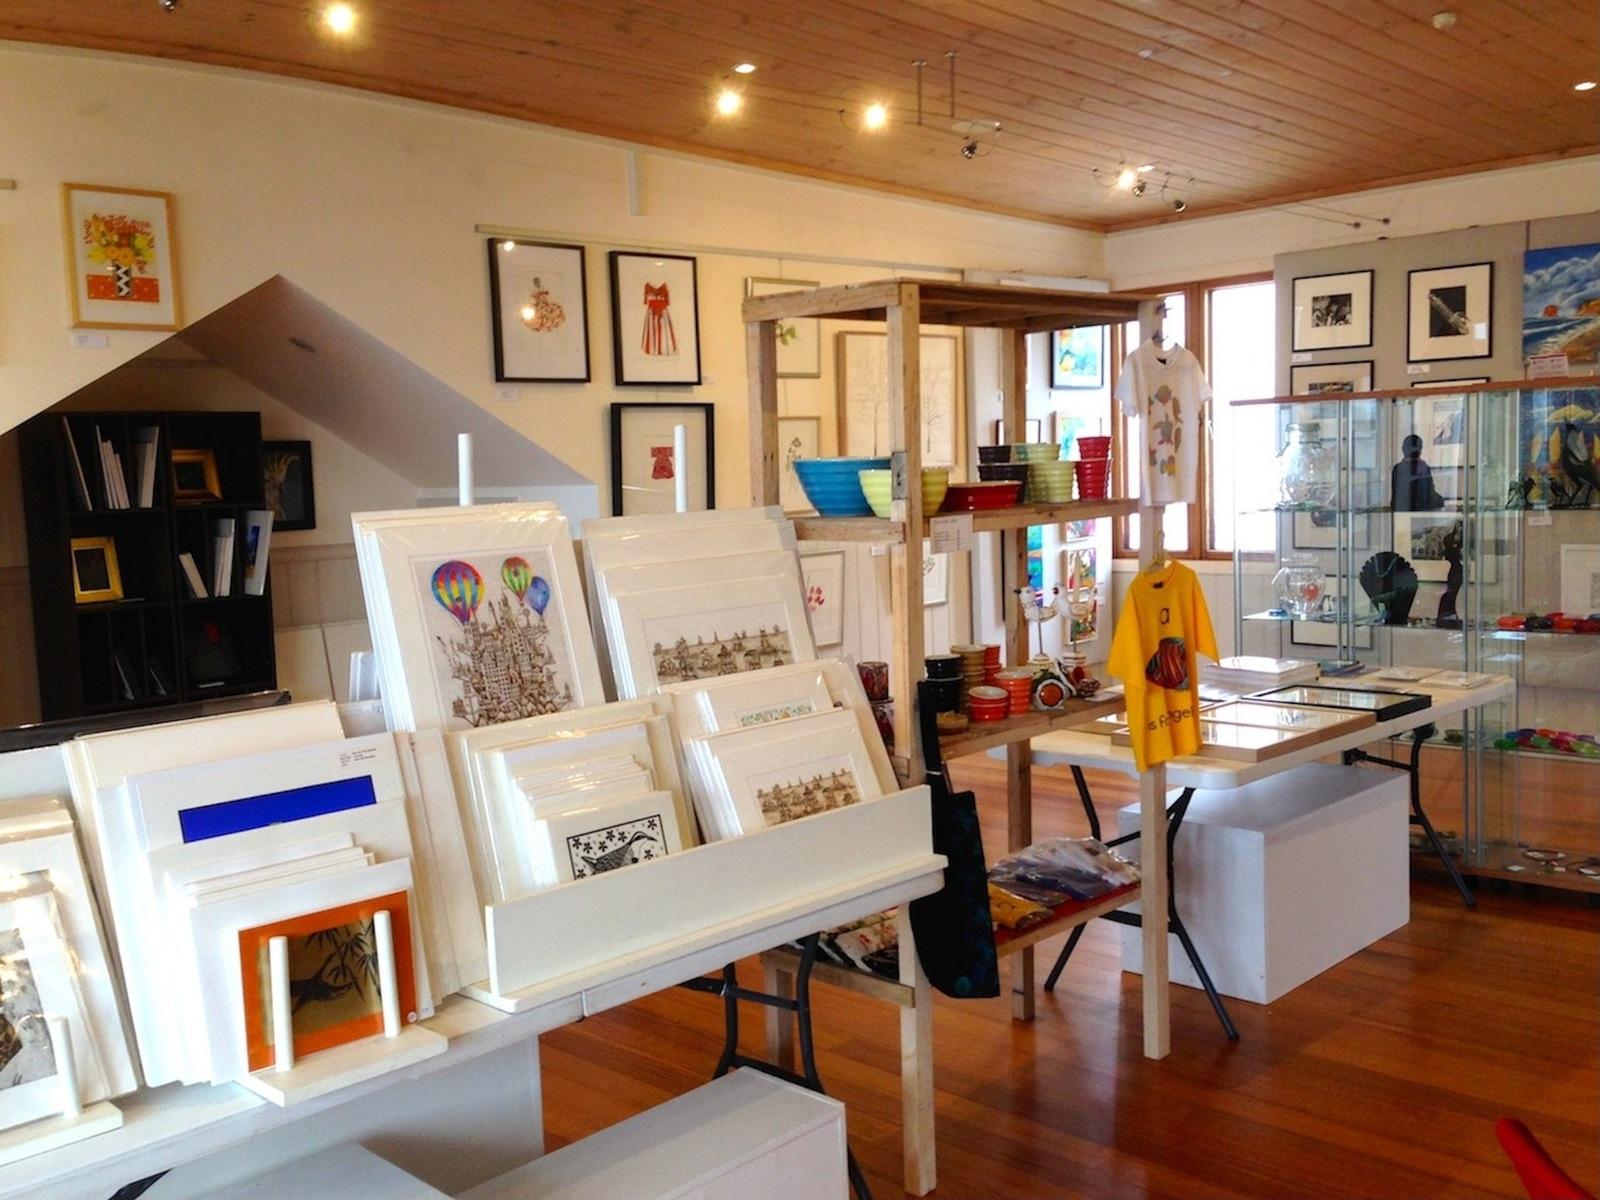 Tussock Upstairs Gallery interior